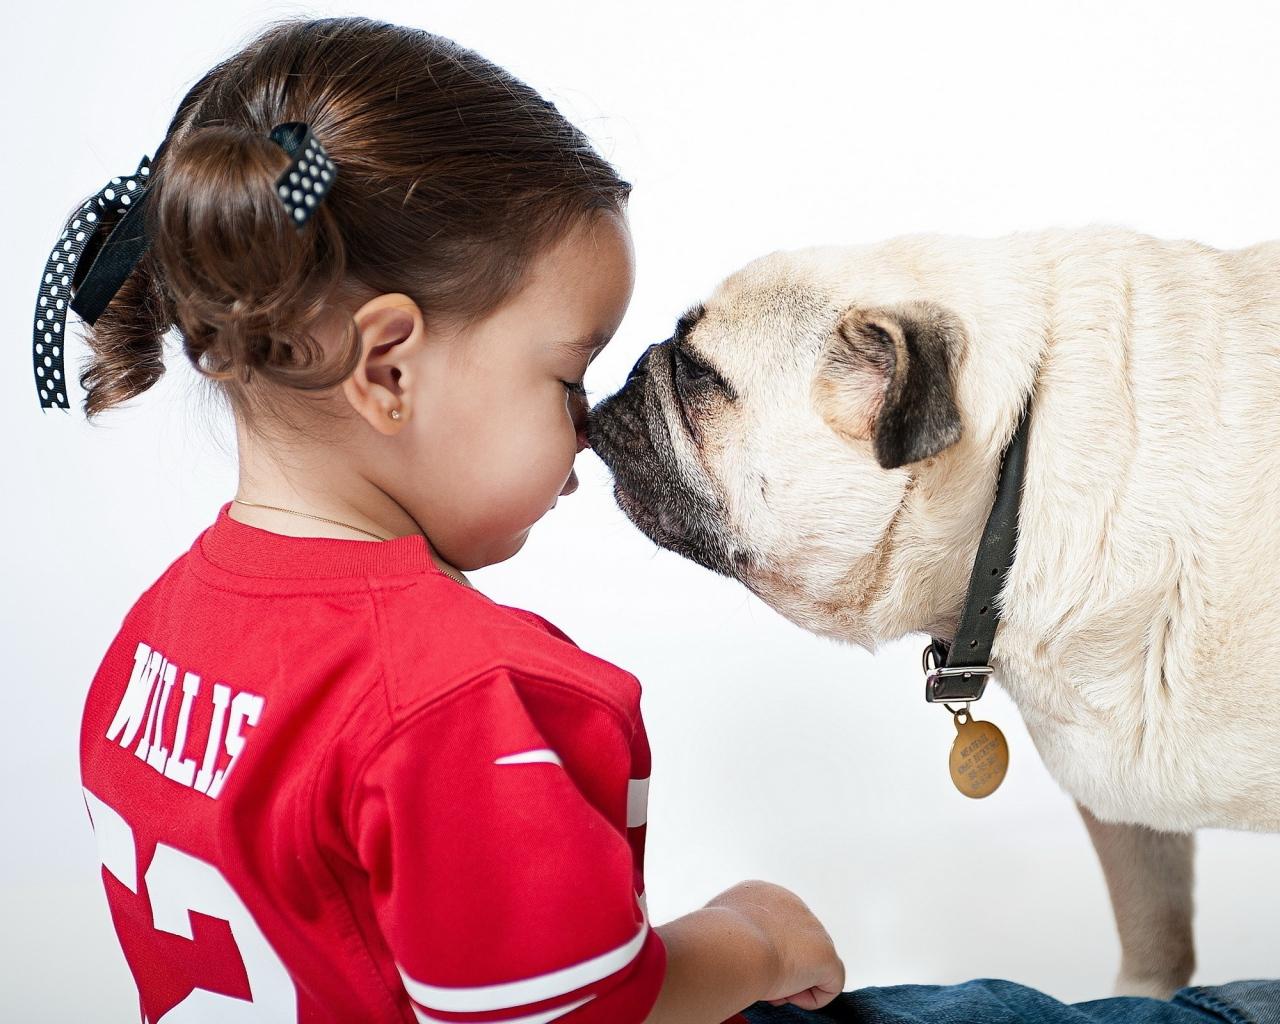 girl_bulldog_play_friendship_59868_1280x1024